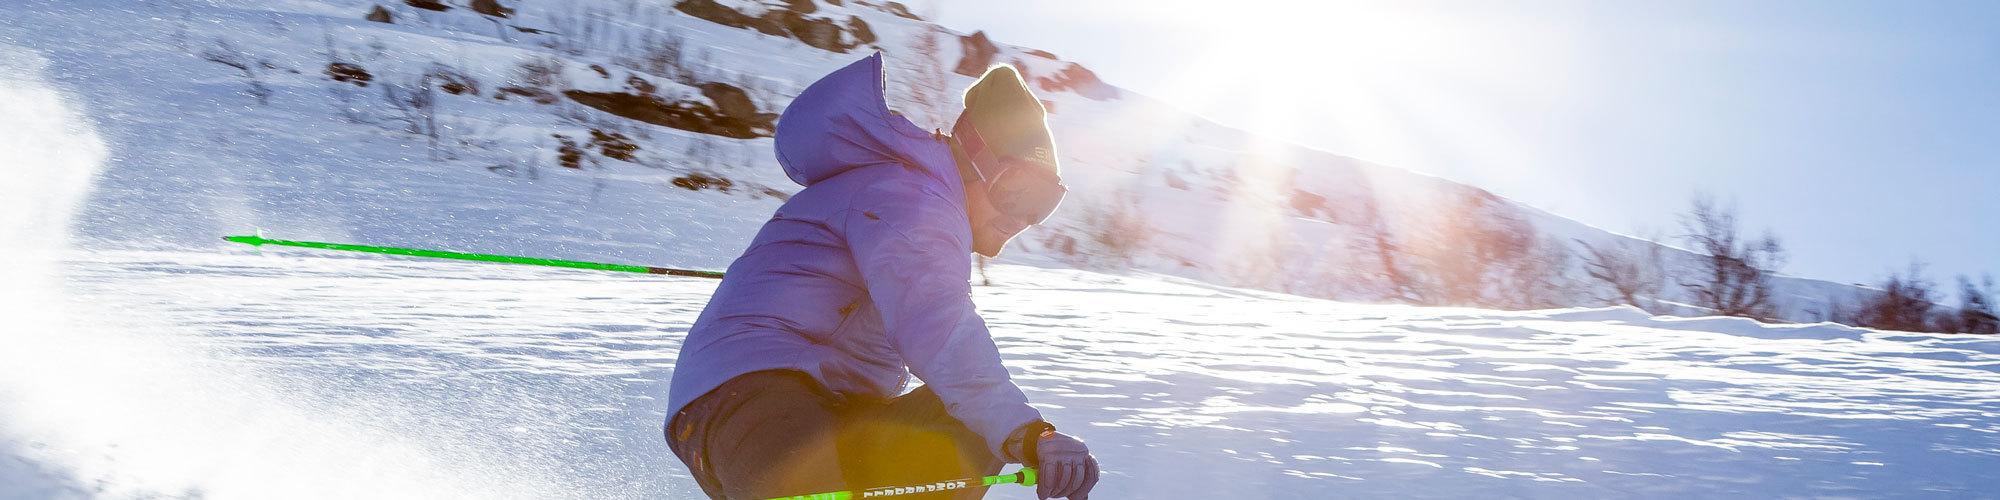 Ski header